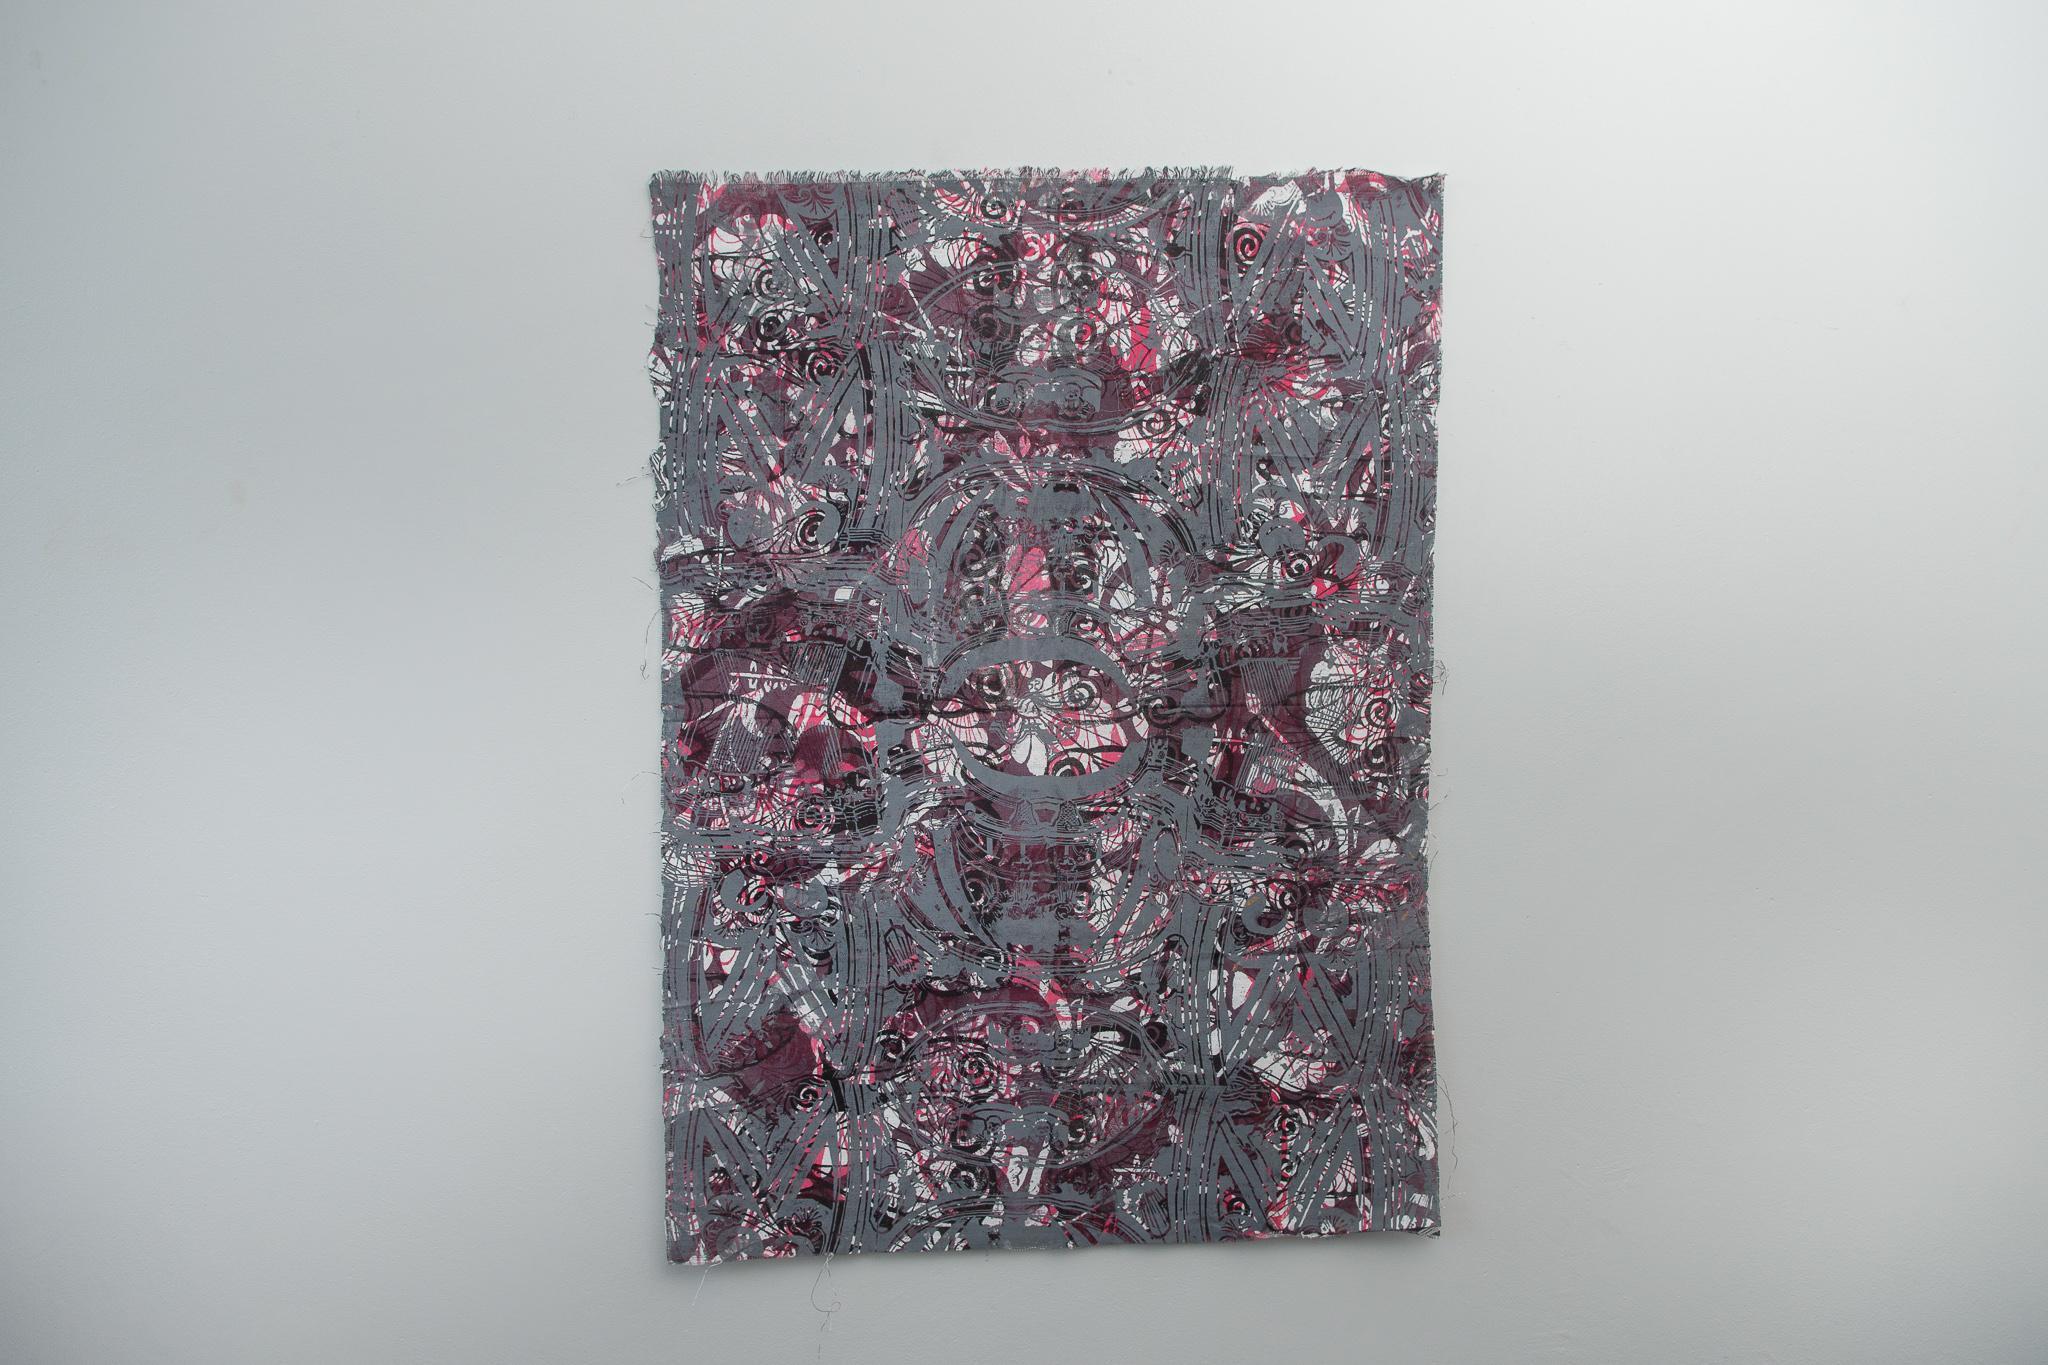 Untitled (Barotik collection), Lynette Diergaardt, Silk Screen and Batik